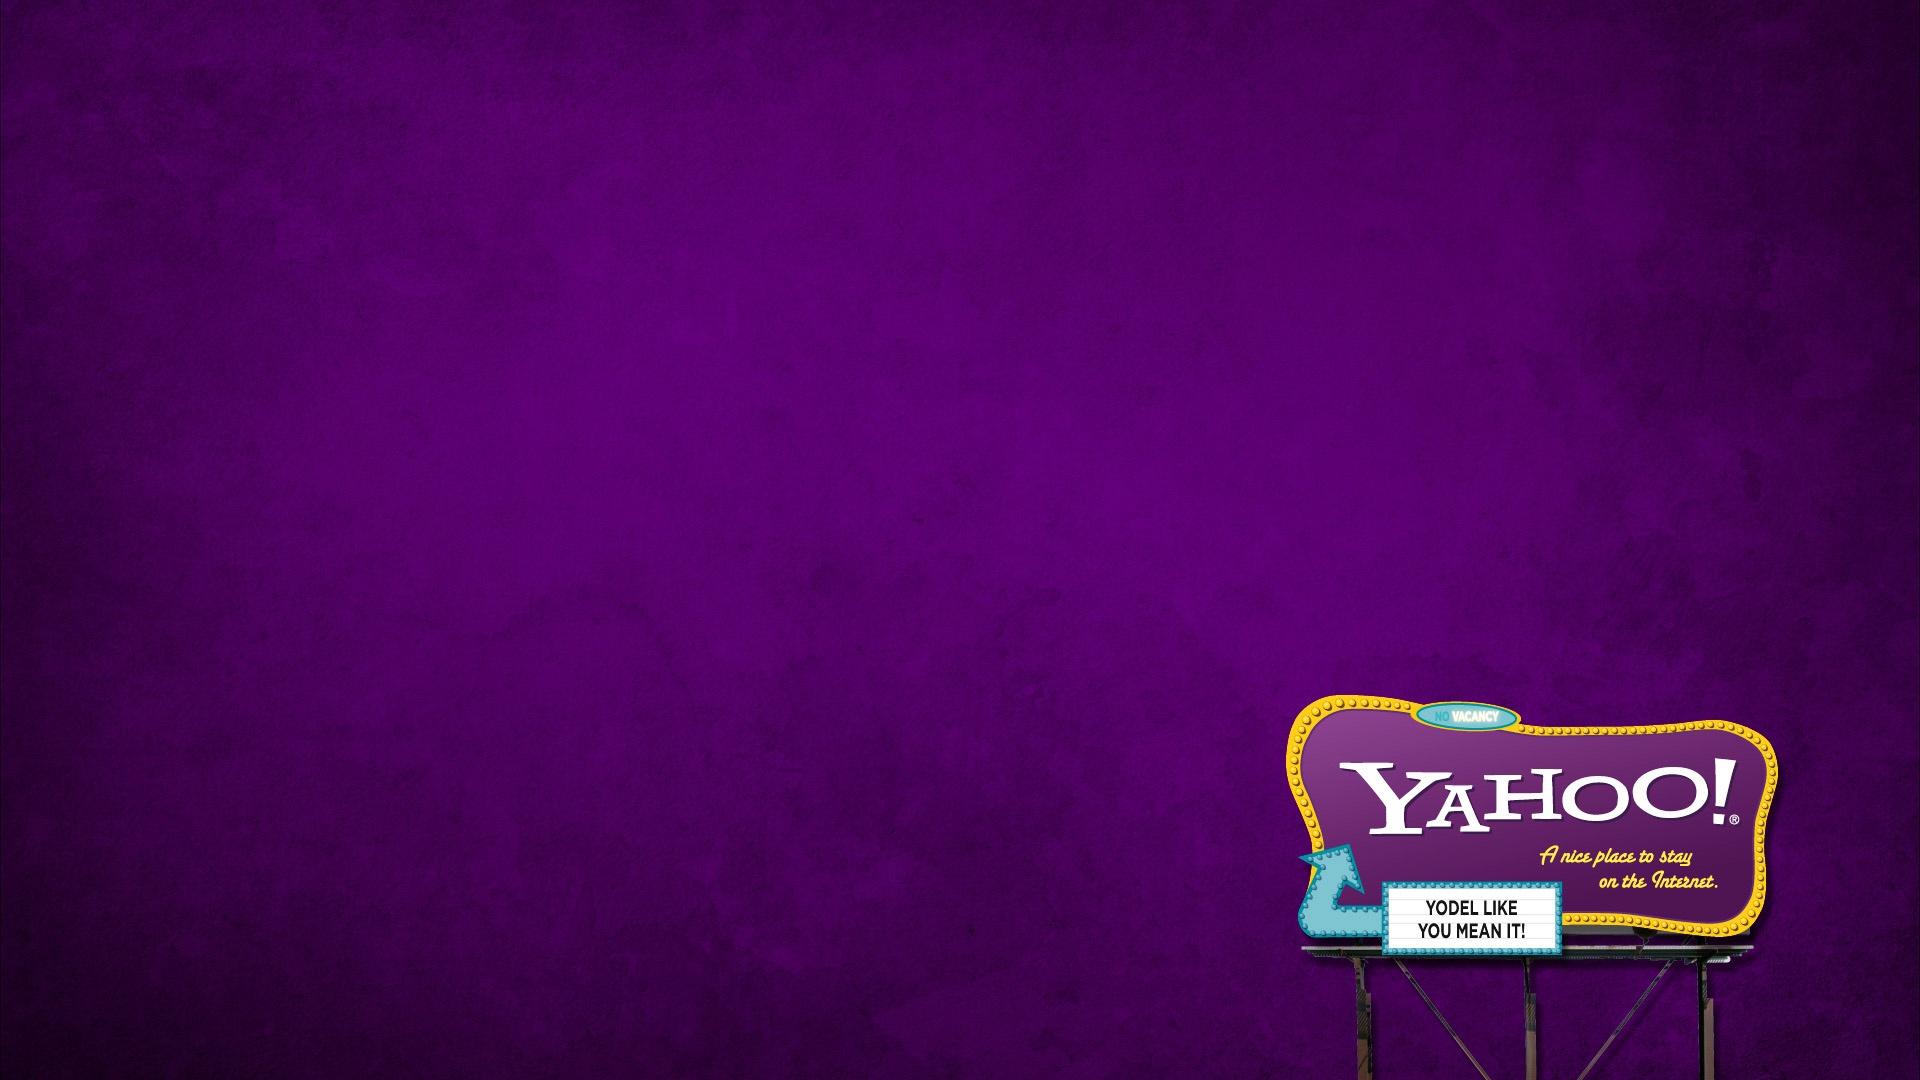 Yahoo Background Wallpaper 1920x1080